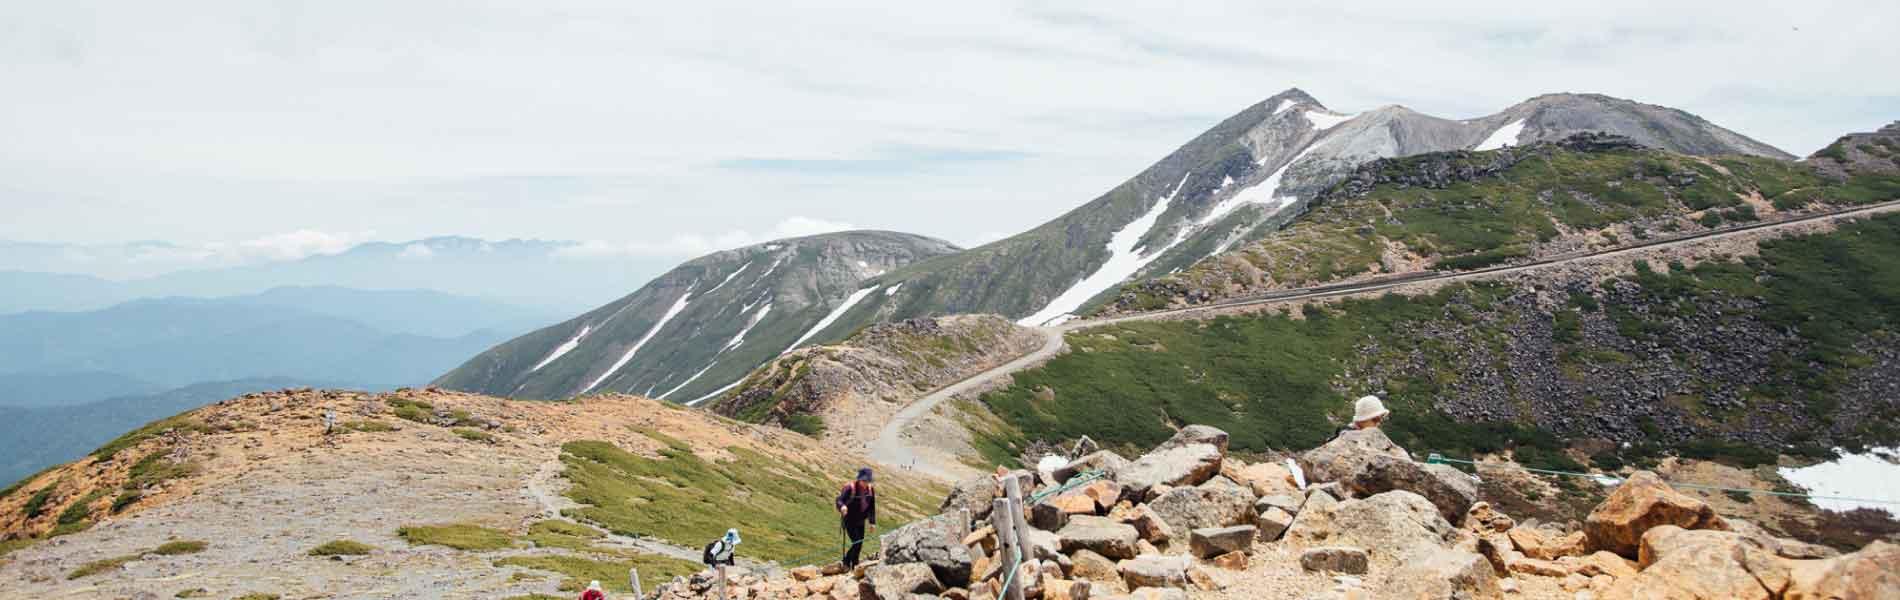 乗鞍岳 Mount Norikura